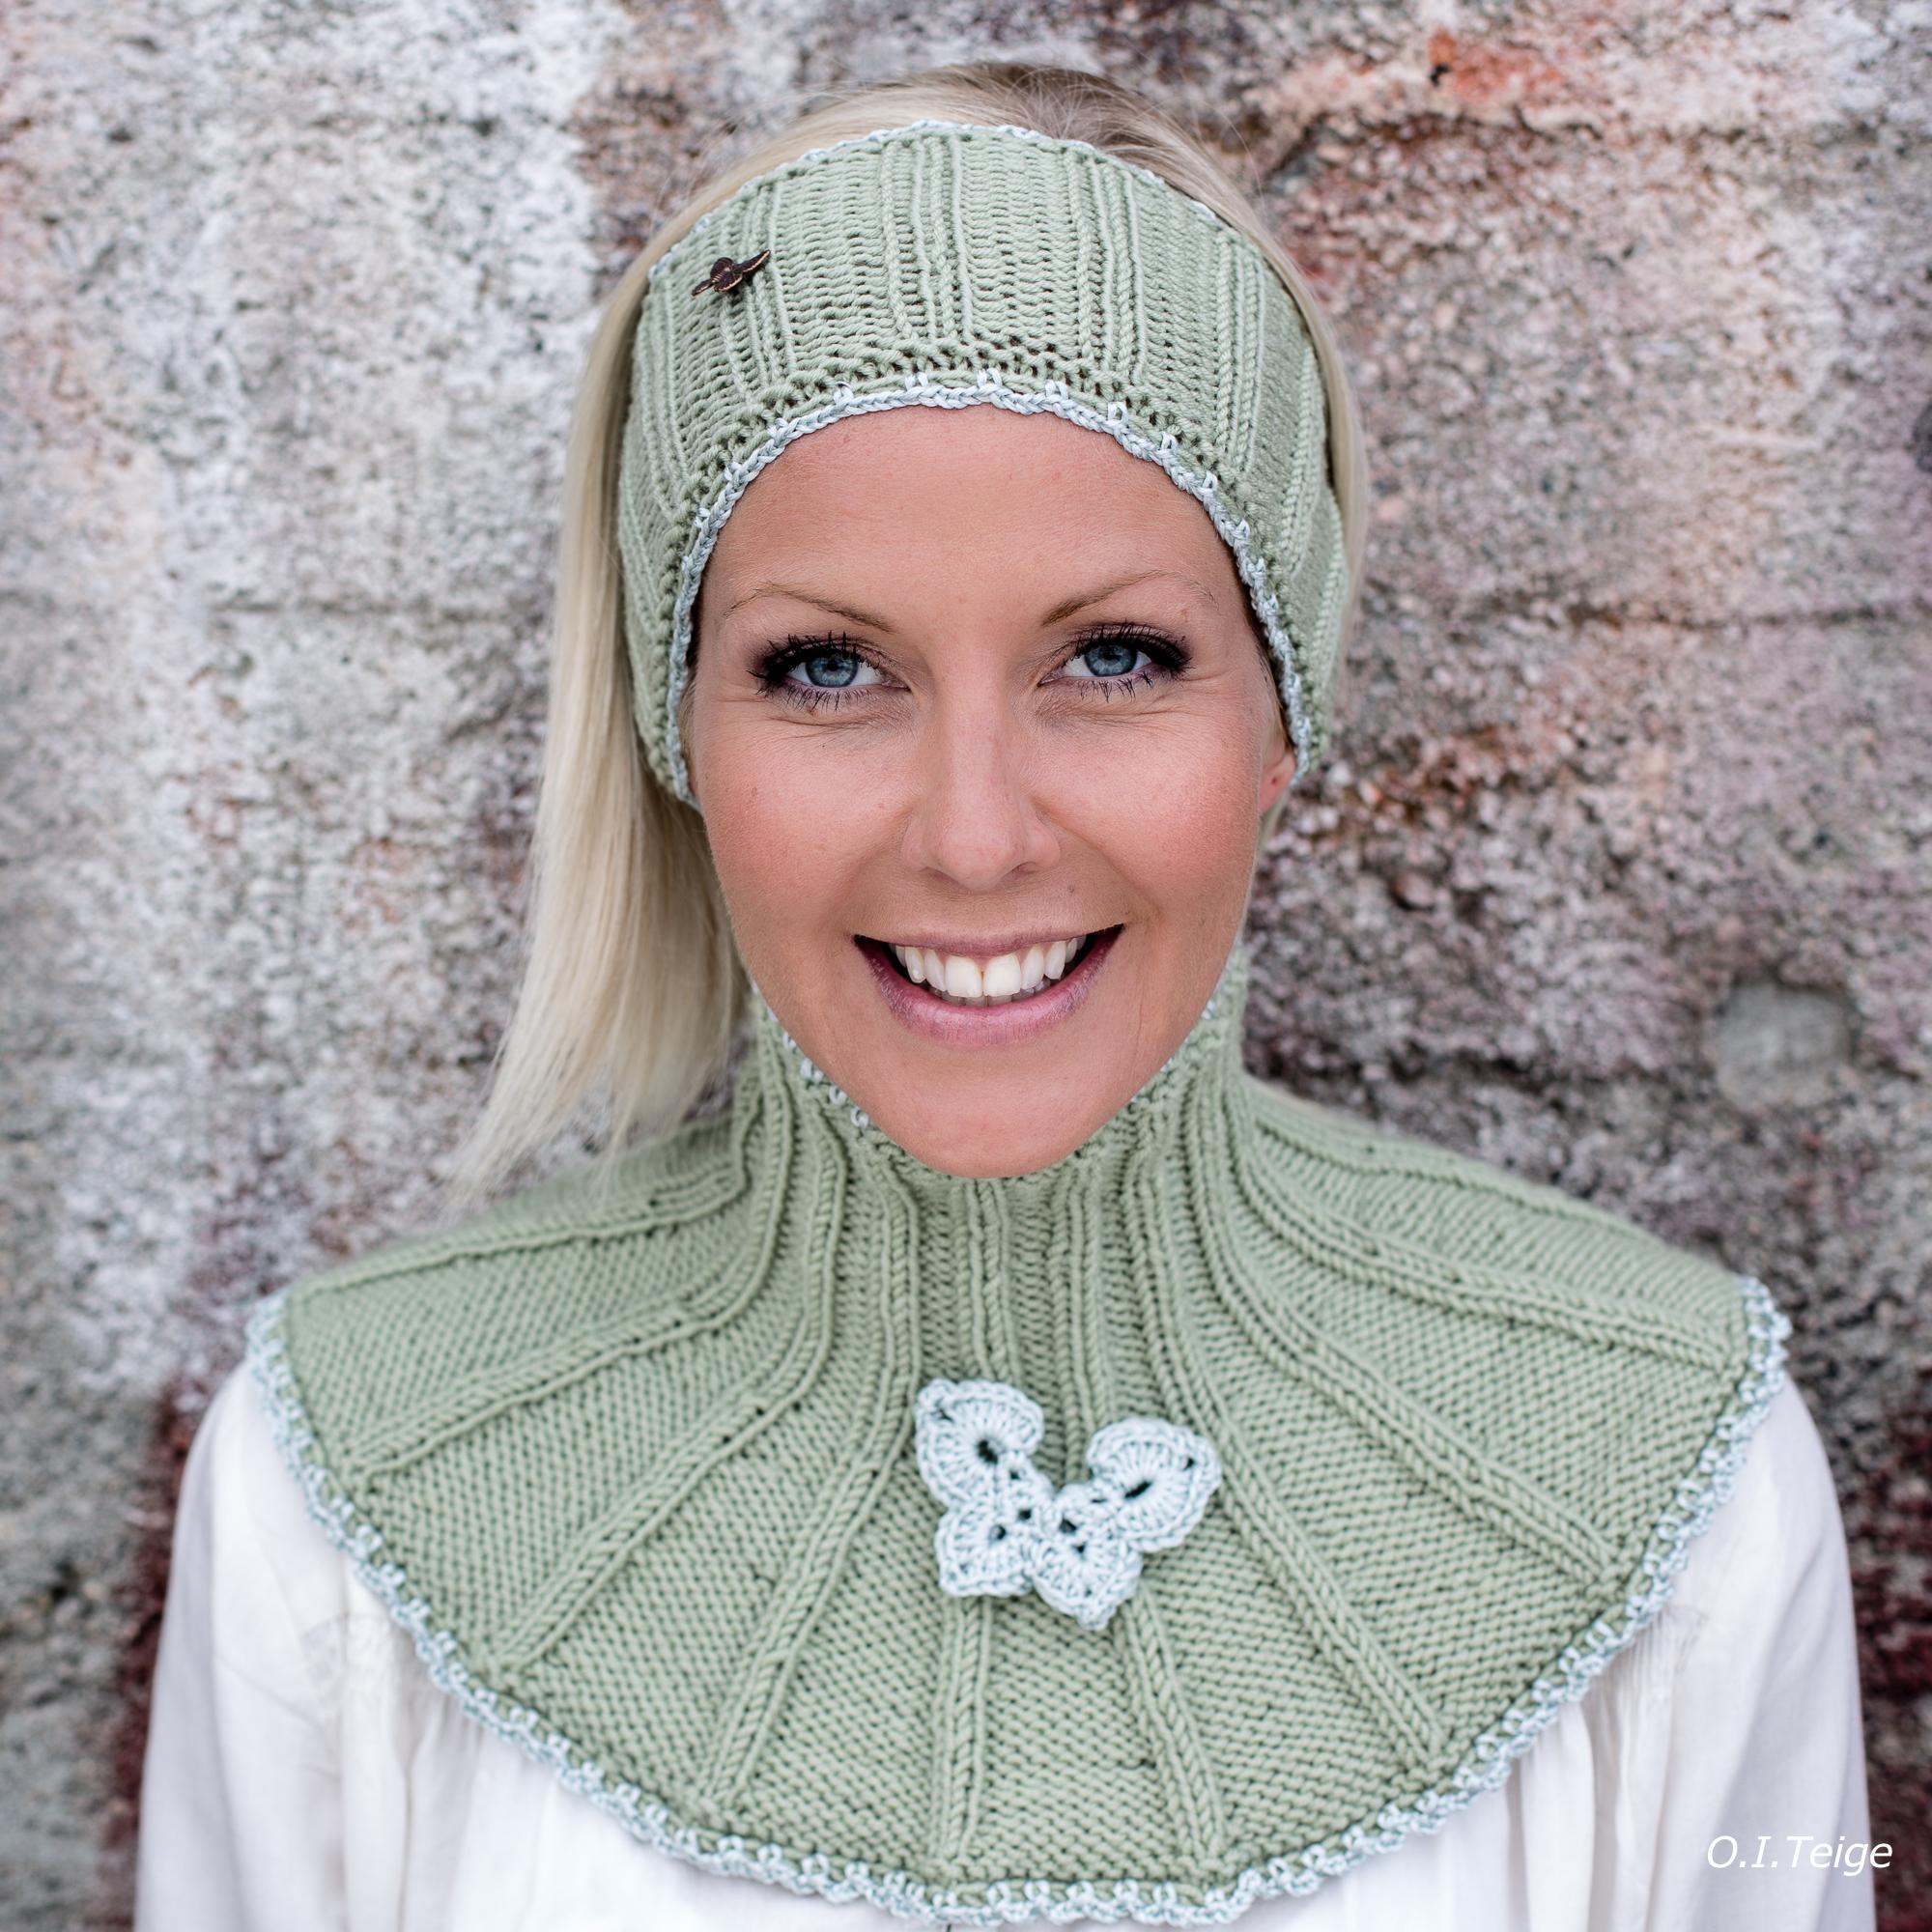 Carina Mjønes, styling byhttp://www.cspabuddakan.no. Costumes byhttp://www.naalfrua.vpweb.no. Photo by Odd Inge Teige